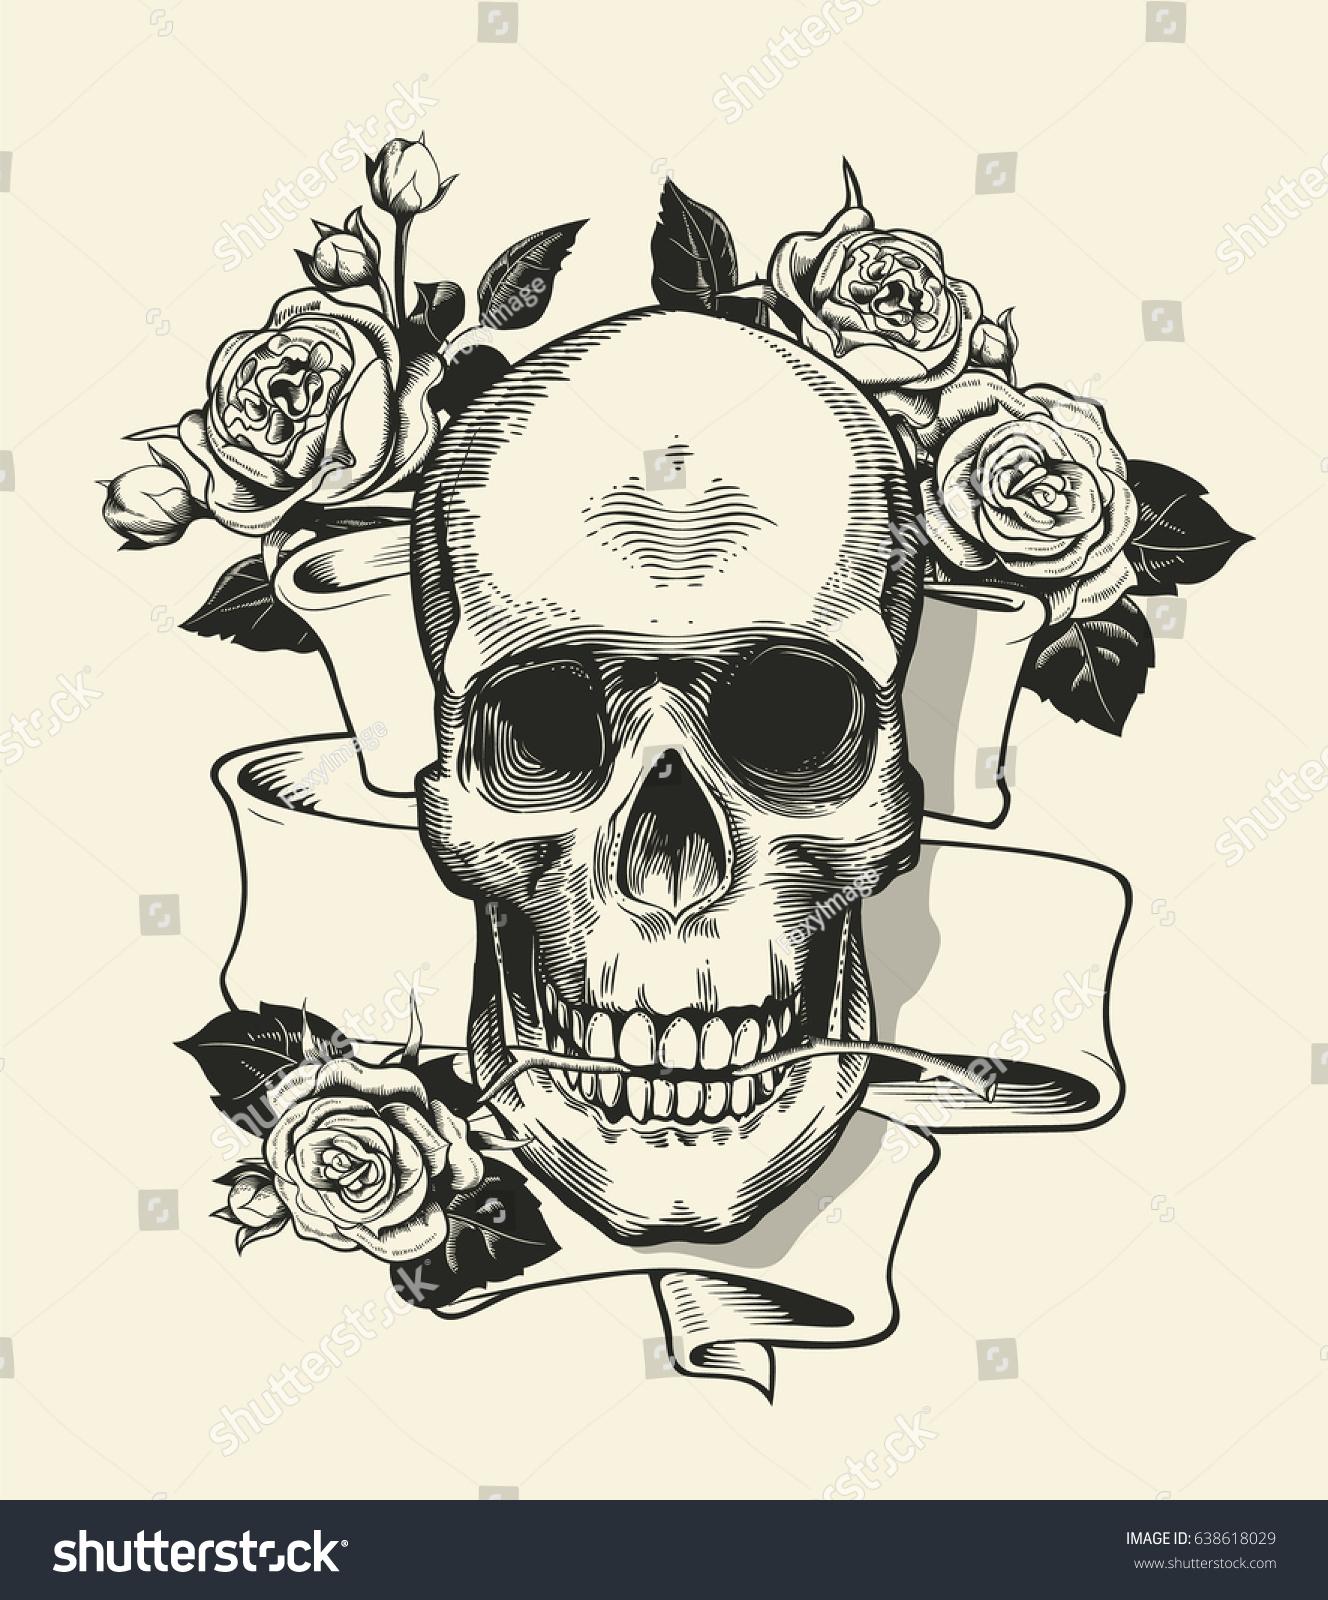 1328x1600 Skull And Rose Ribbon Drawings 35 Gothic Skull Tattoos